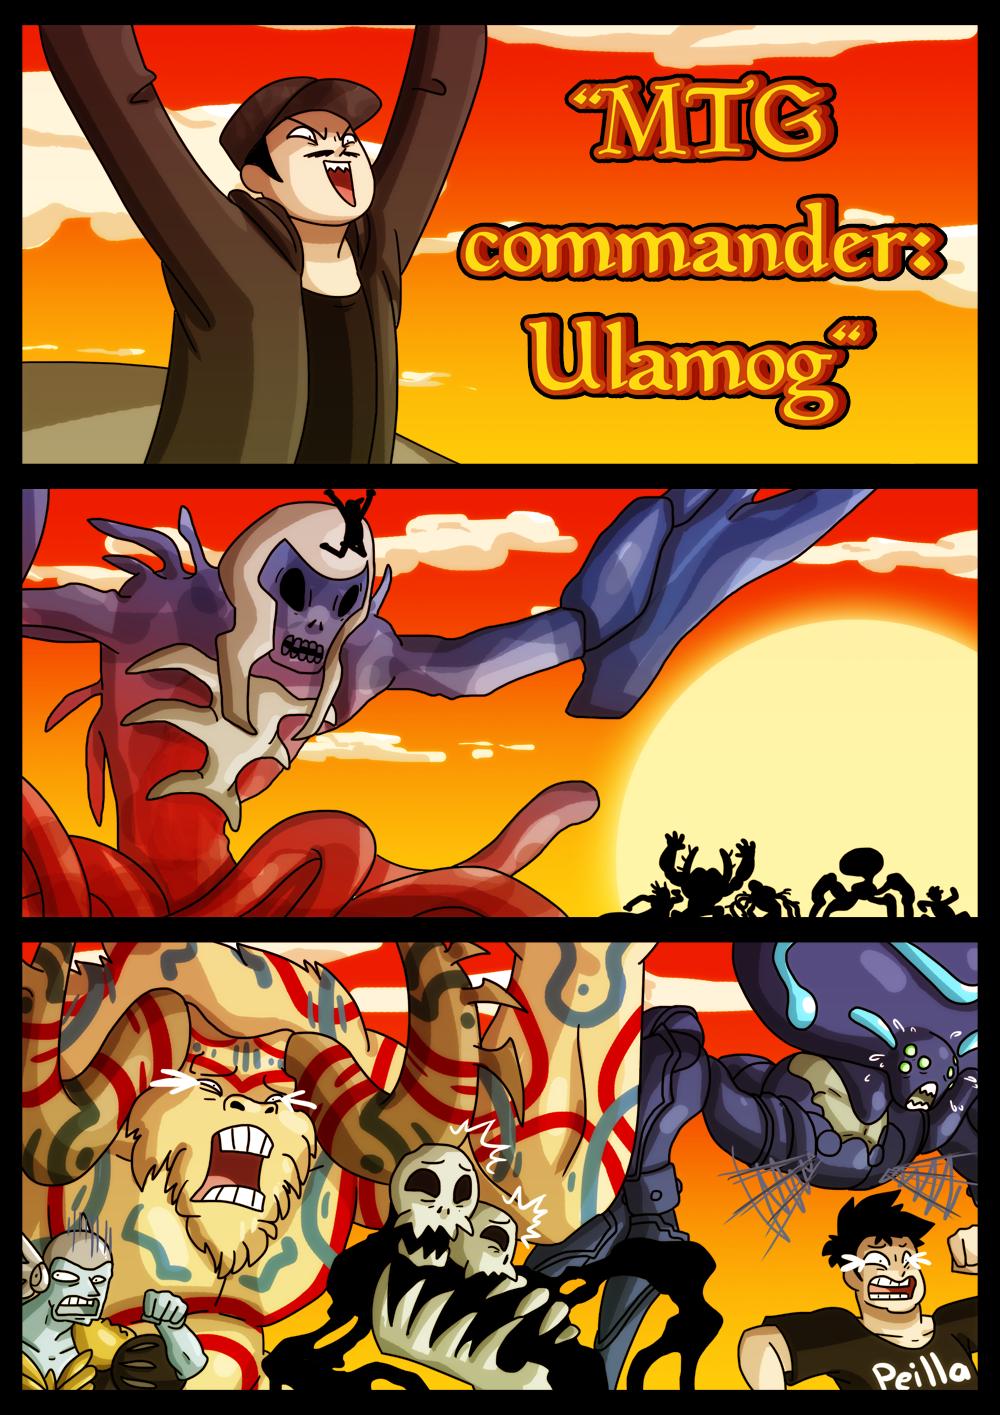 colorless commander: ulamog